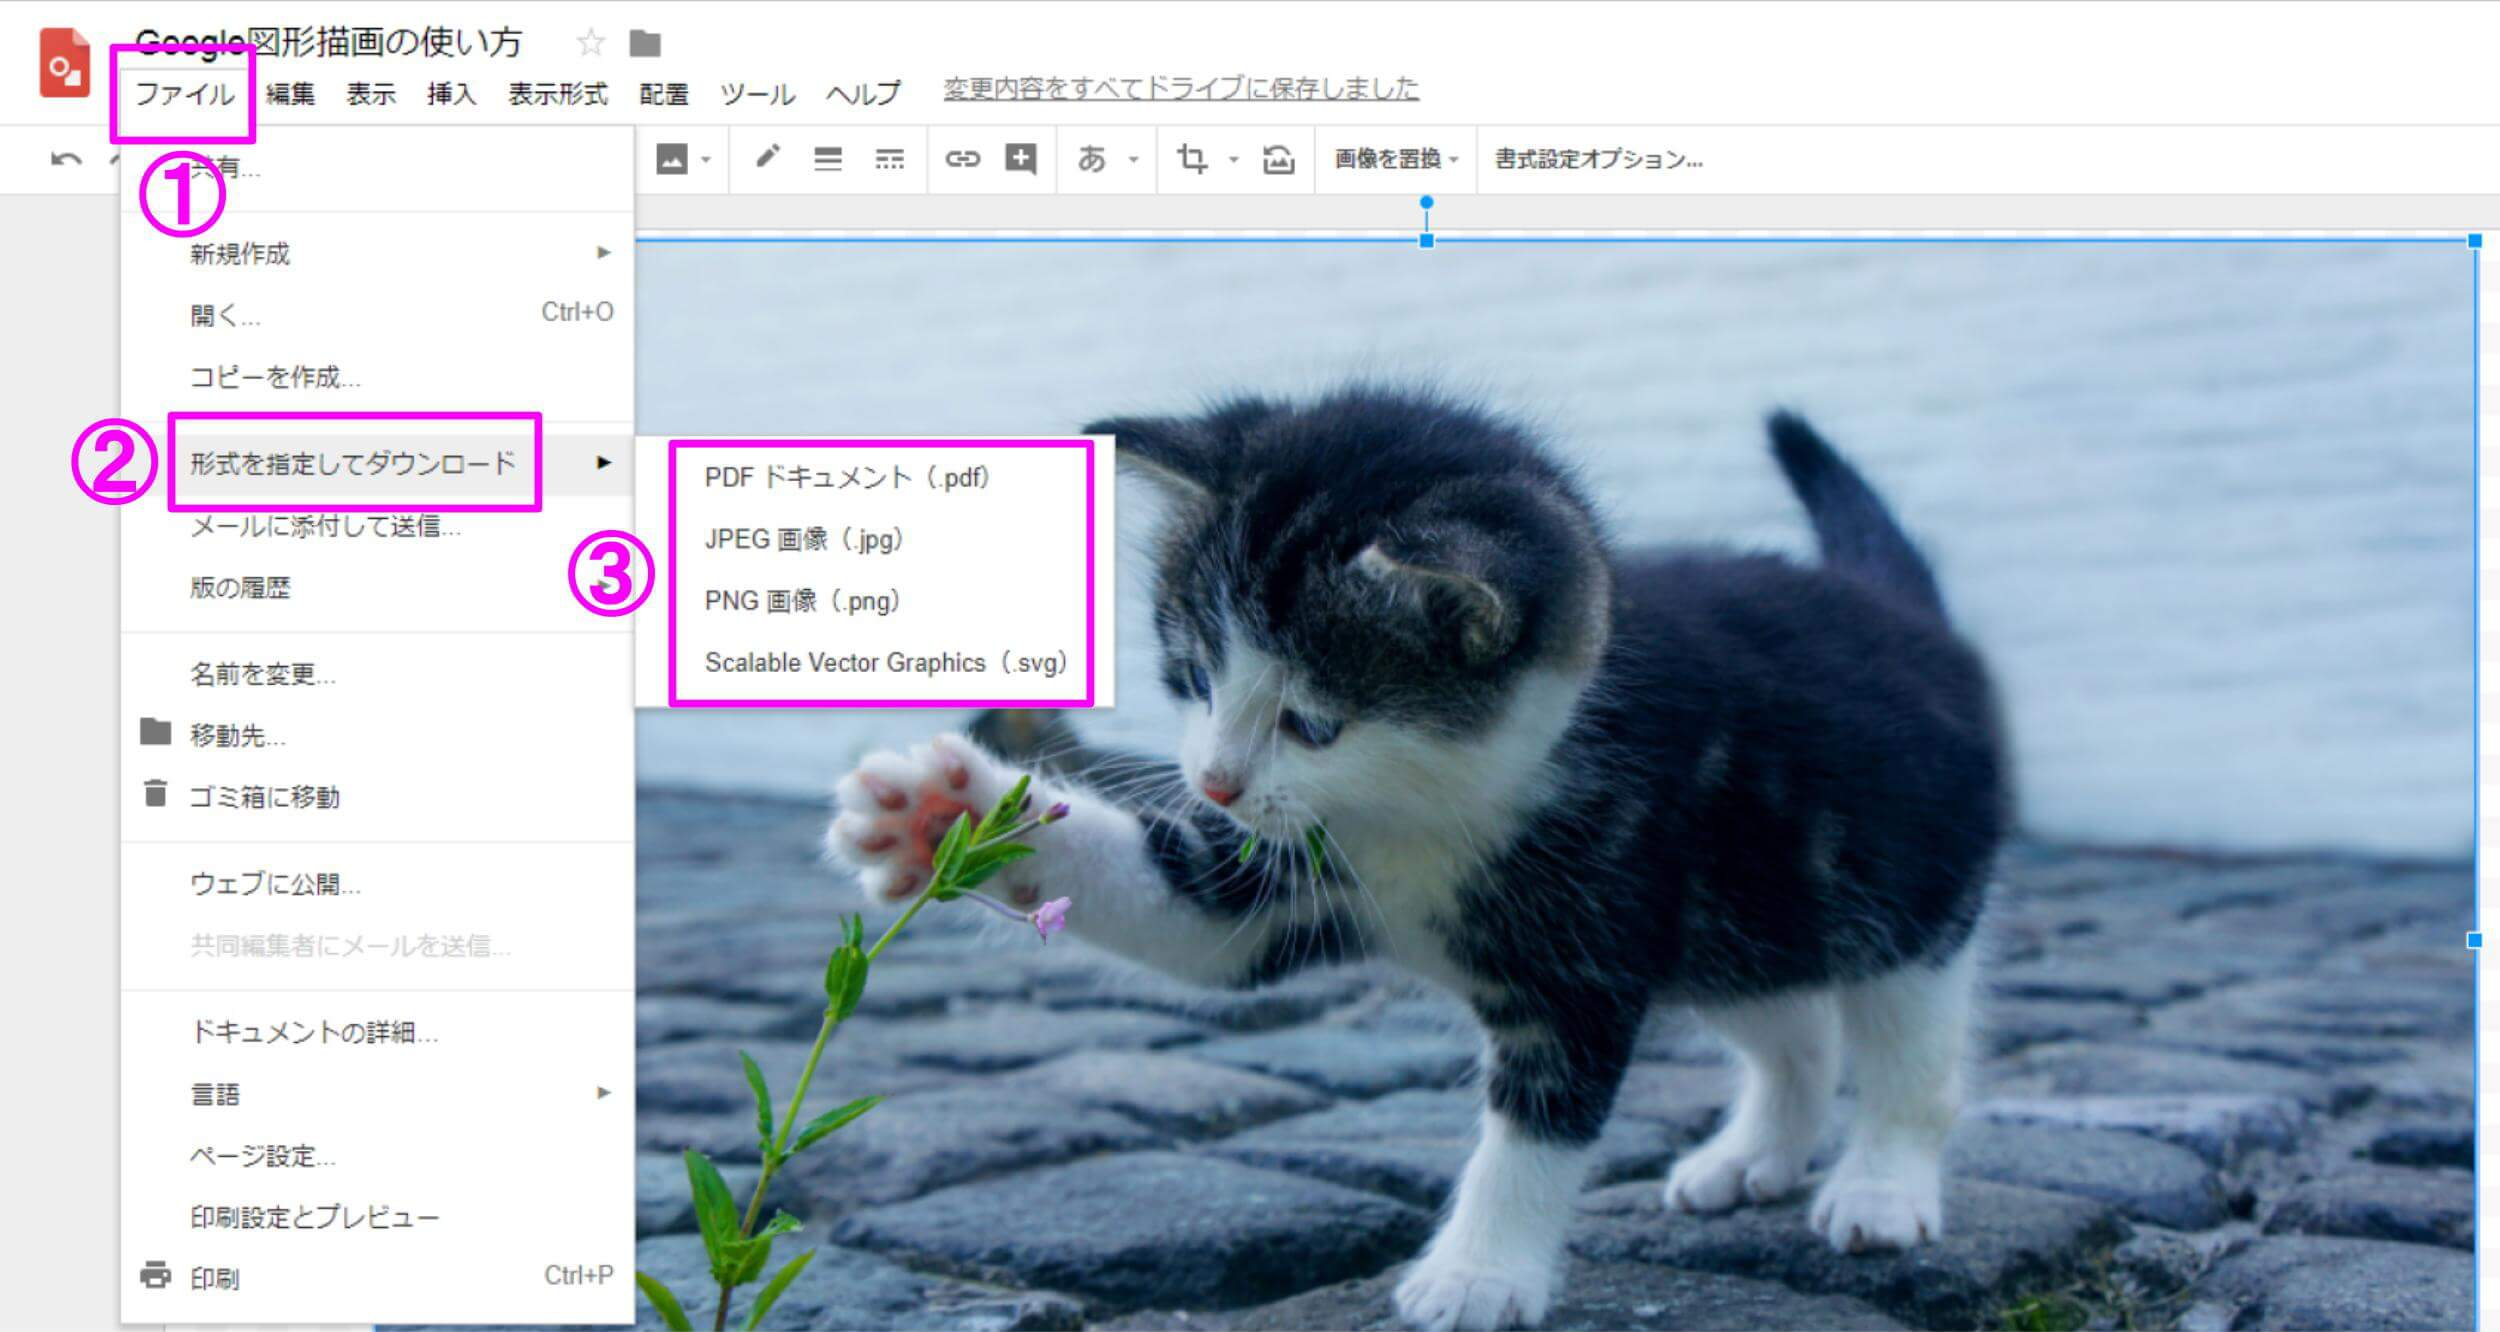 Google図形描画の使い方 ファイル→形式を指定してダウンロード→画像形式選択